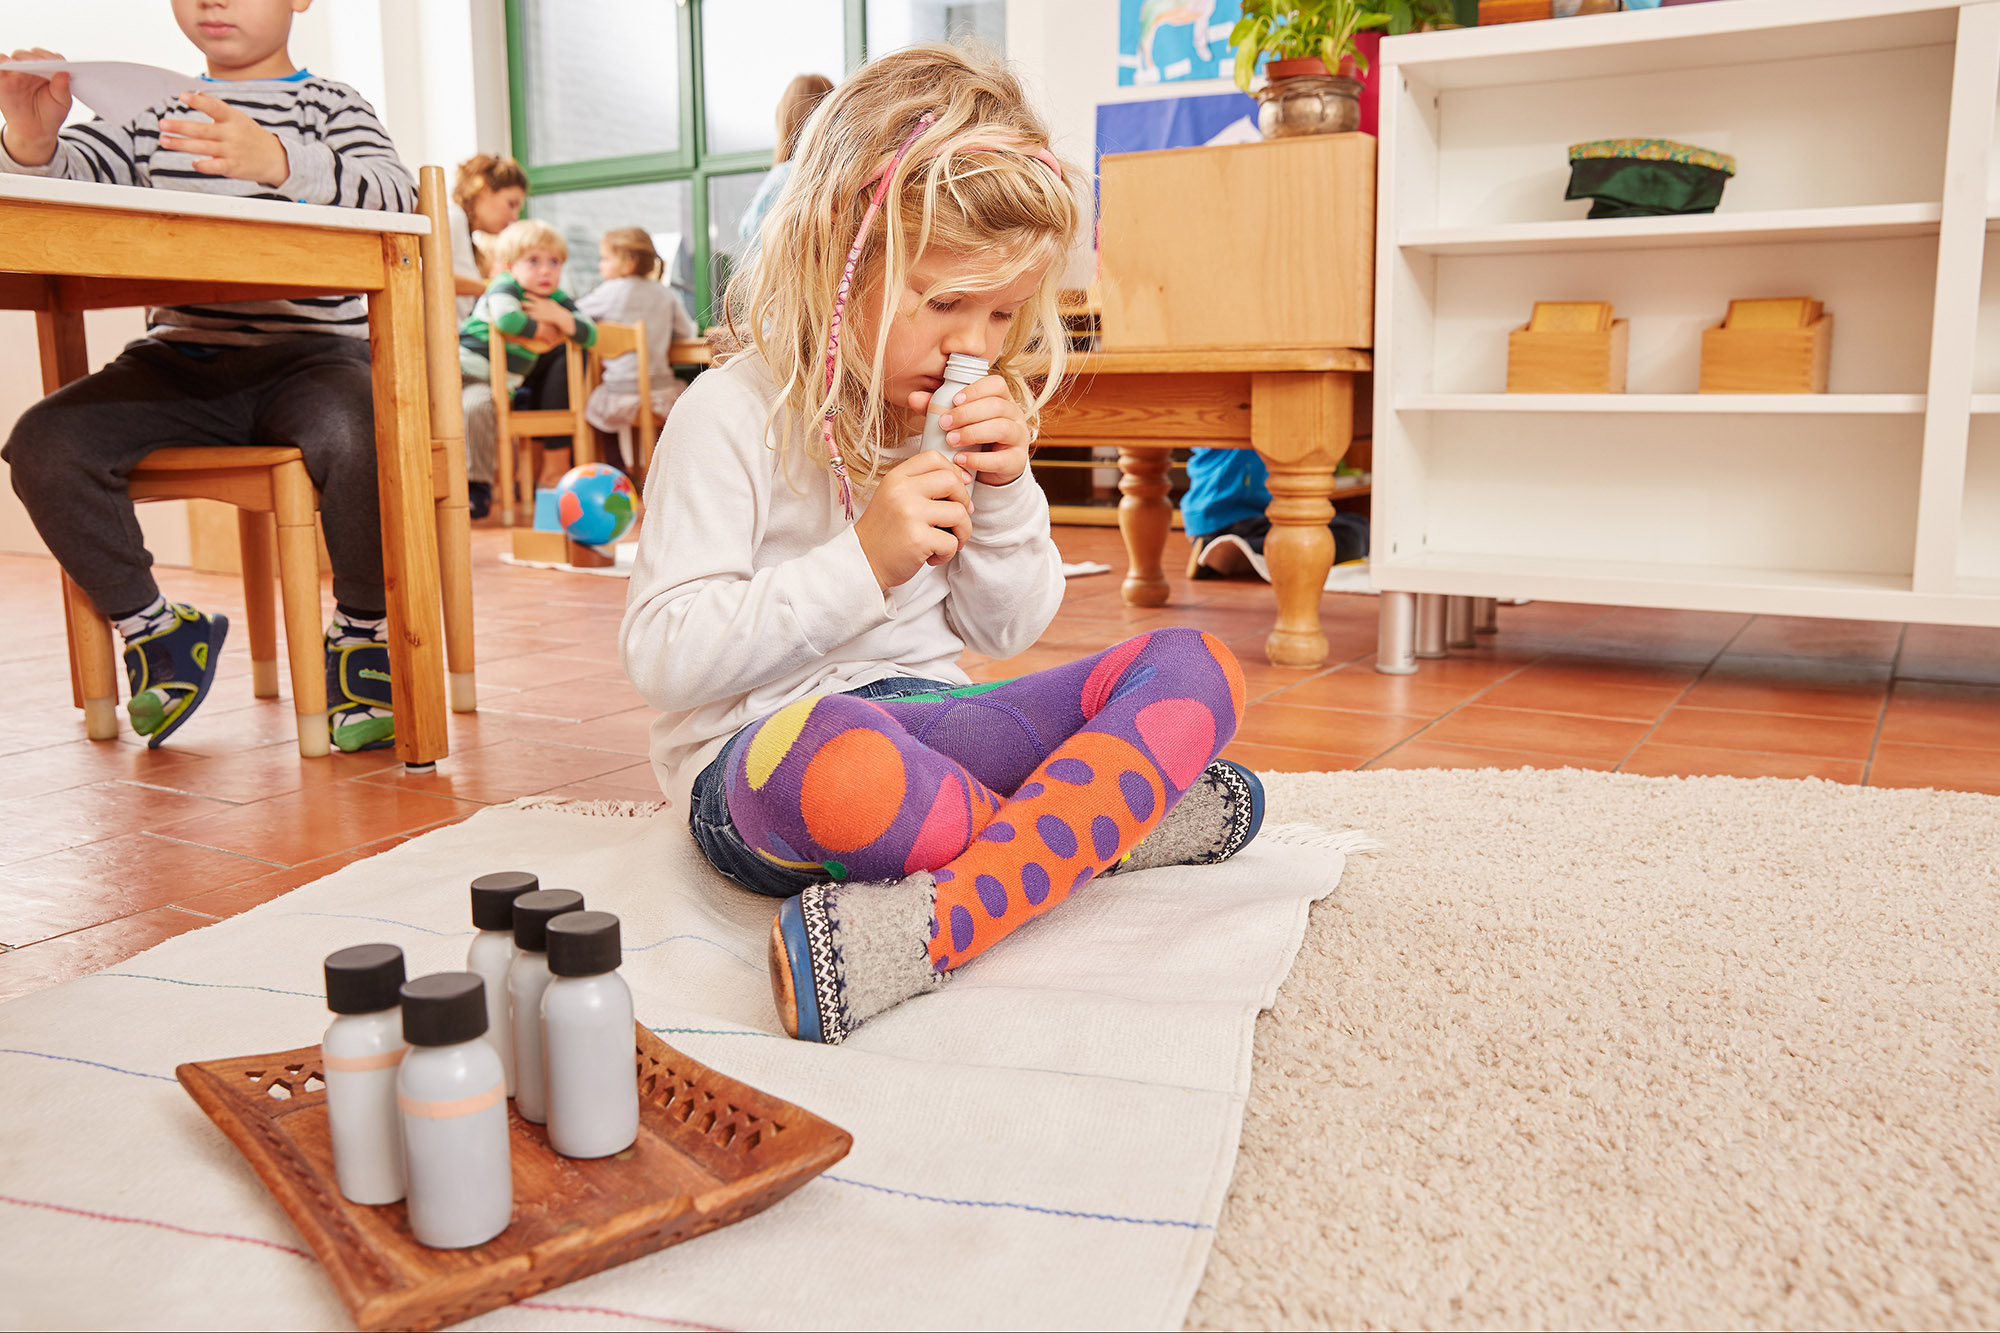 SPUISERS montessori materiaal kind boeken maria montessori